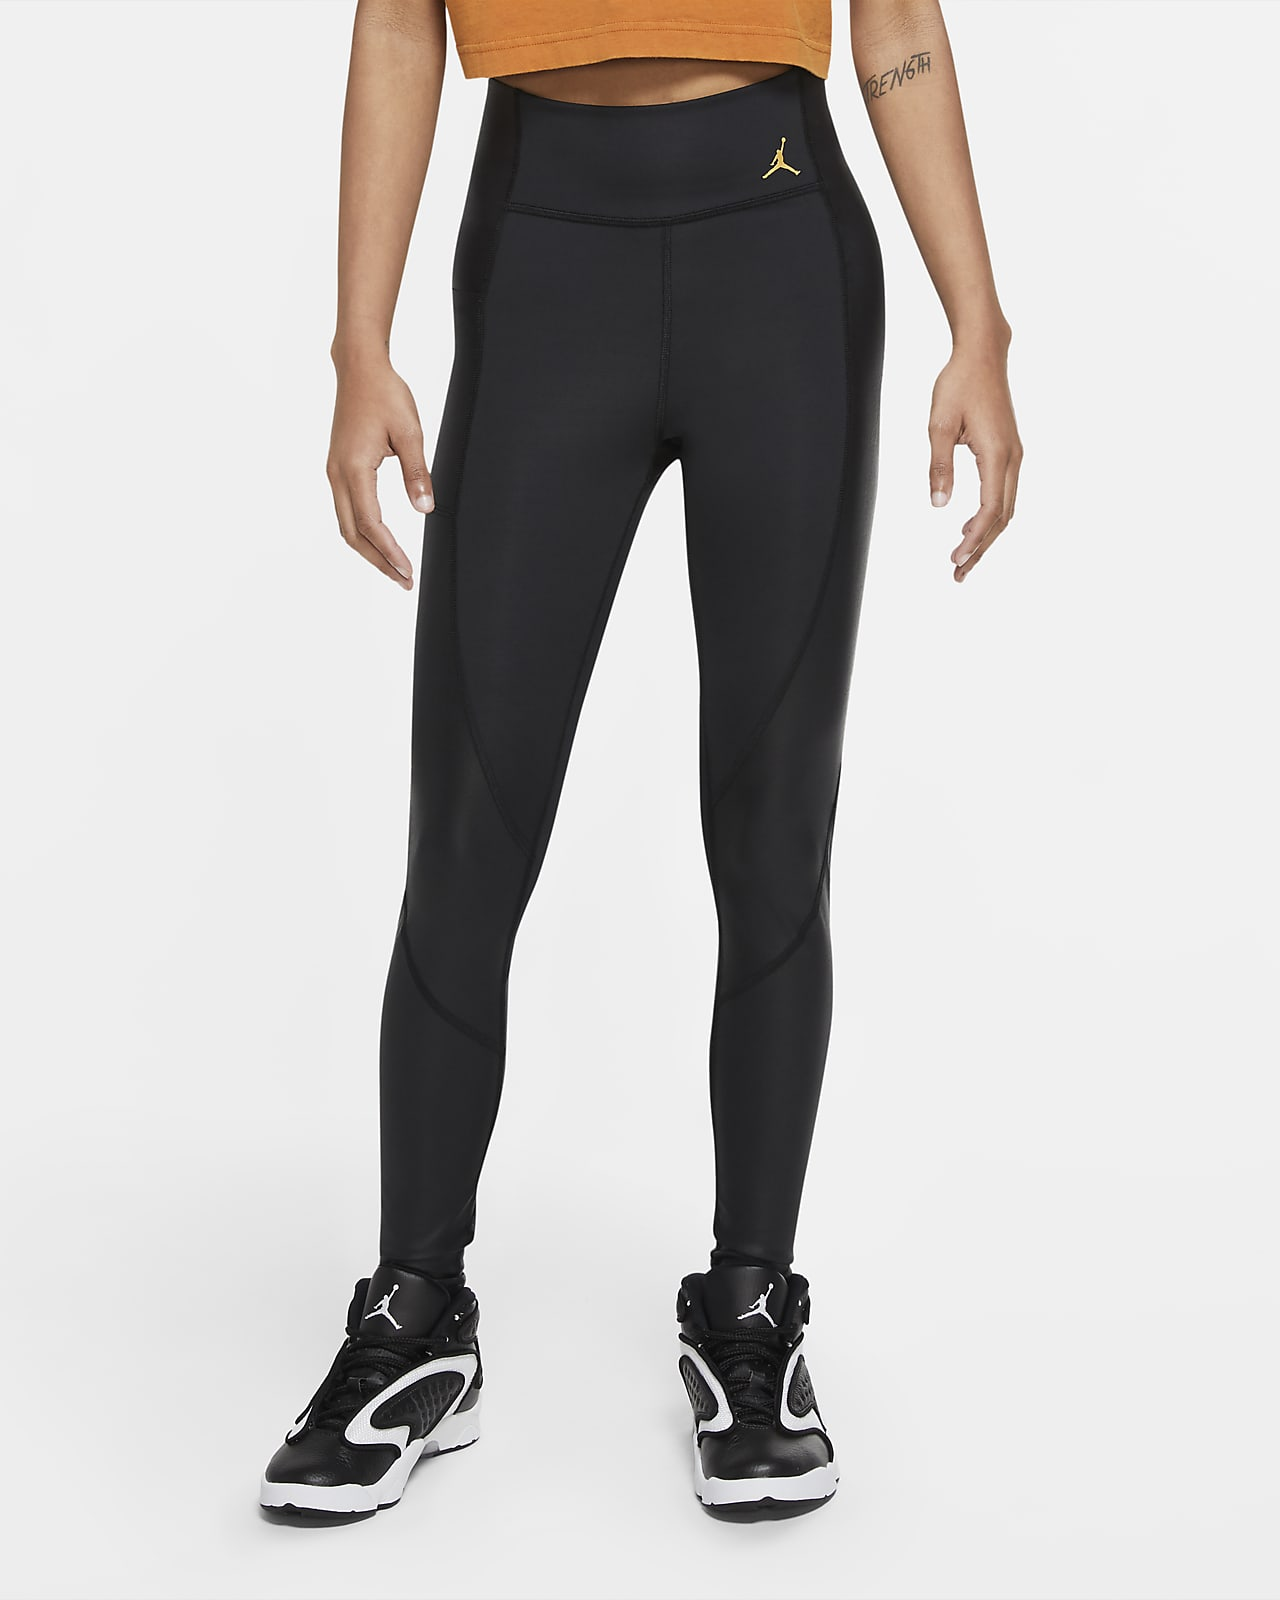 Jordan Court-To-Runway Women's Leggings